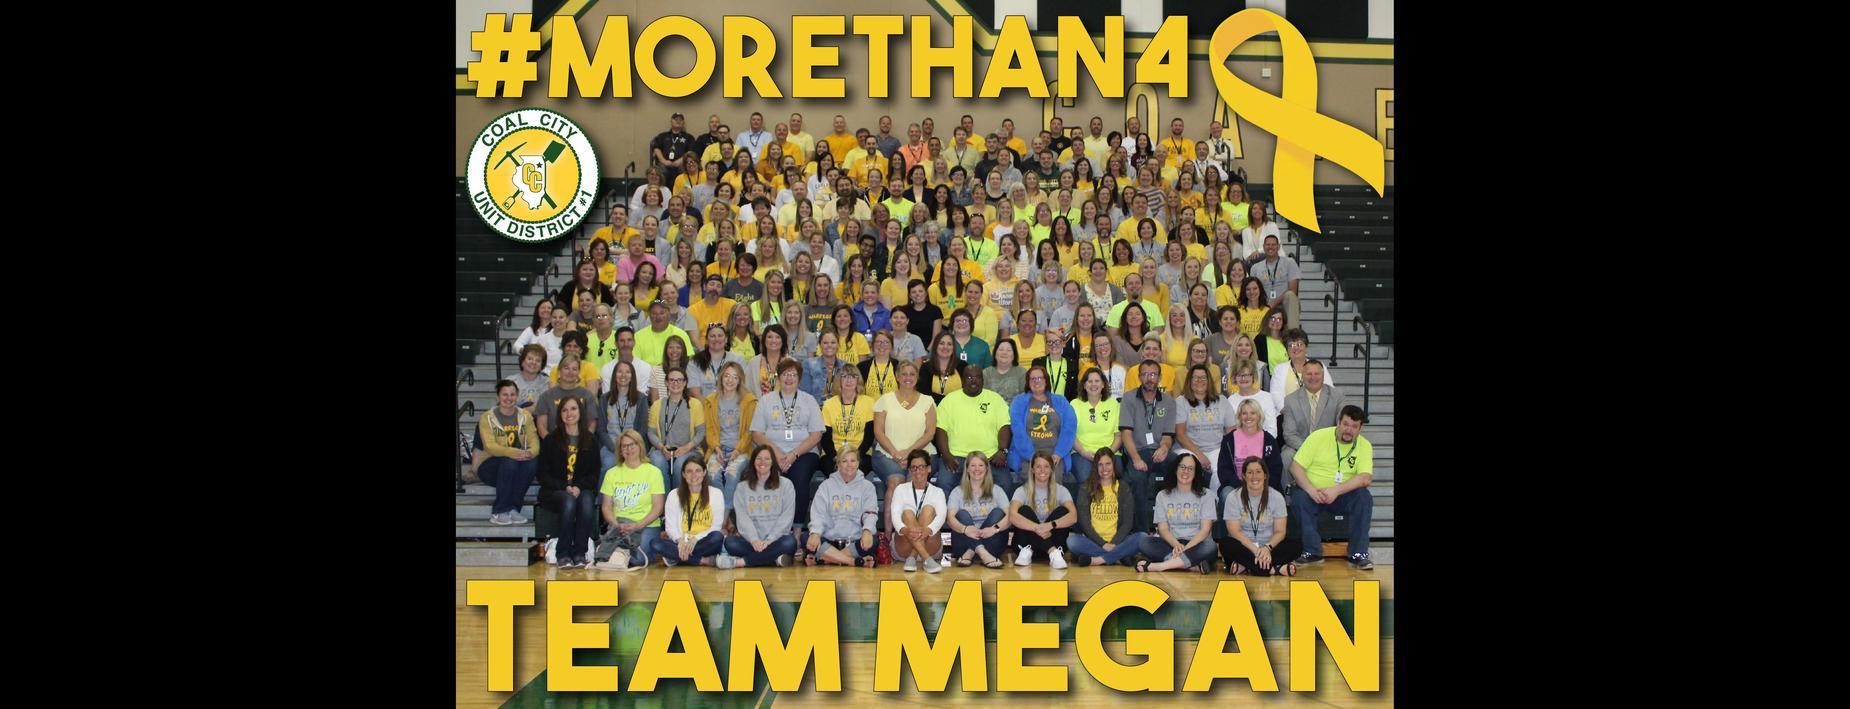 Team Megan!